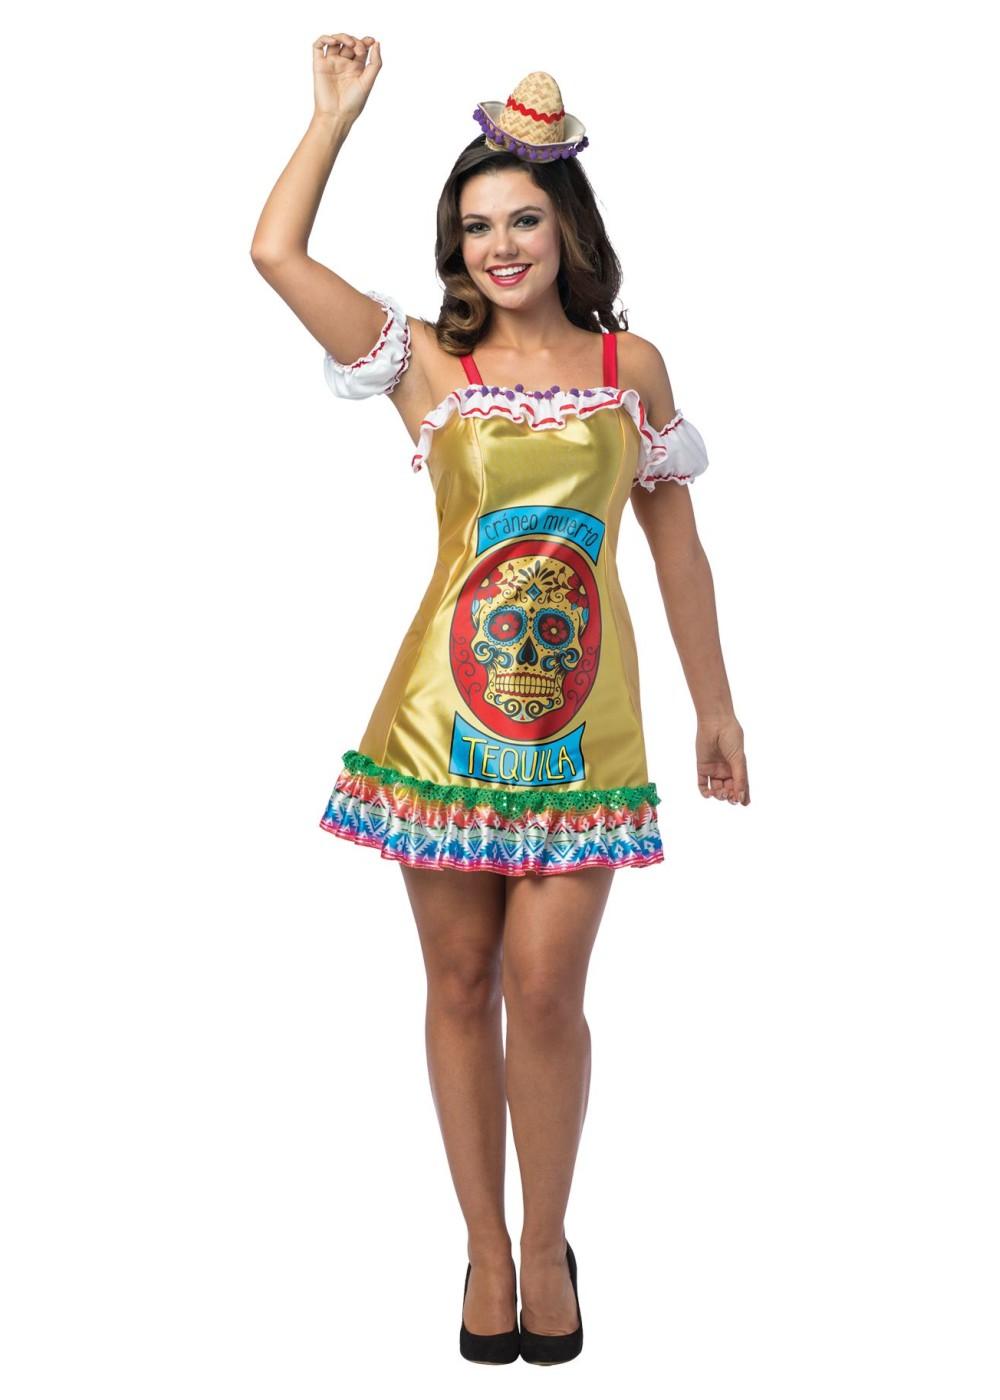 69af5f8b965 Womens Tequila Dress Costume - Food Costumes